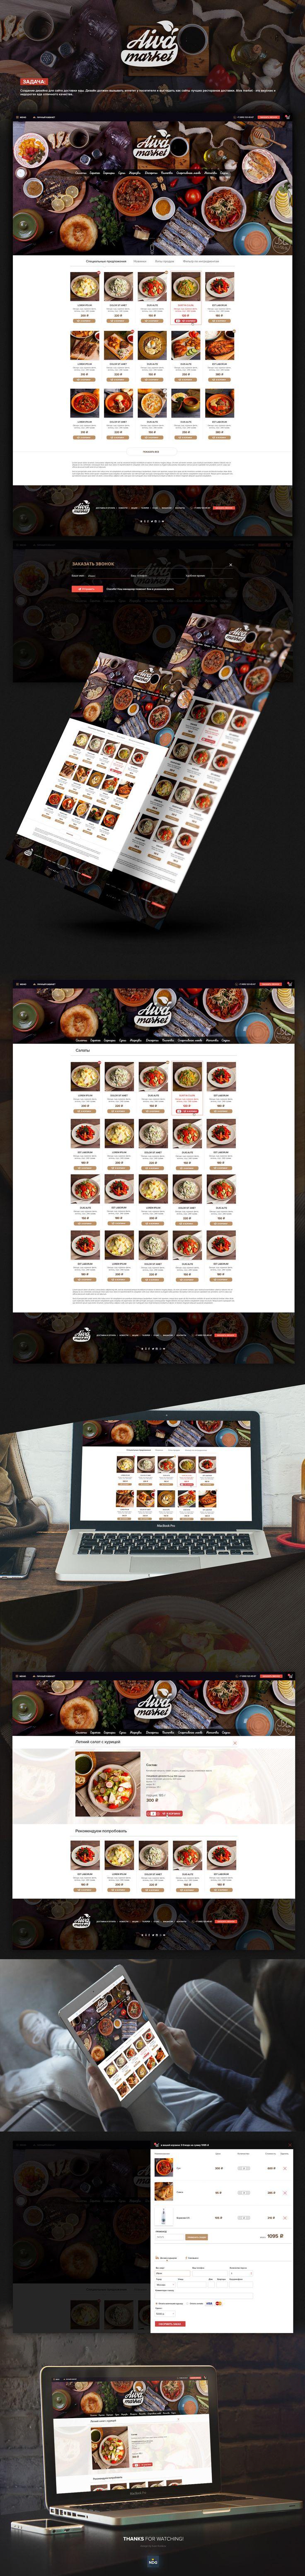 Aiva market - catering shop design on Behance